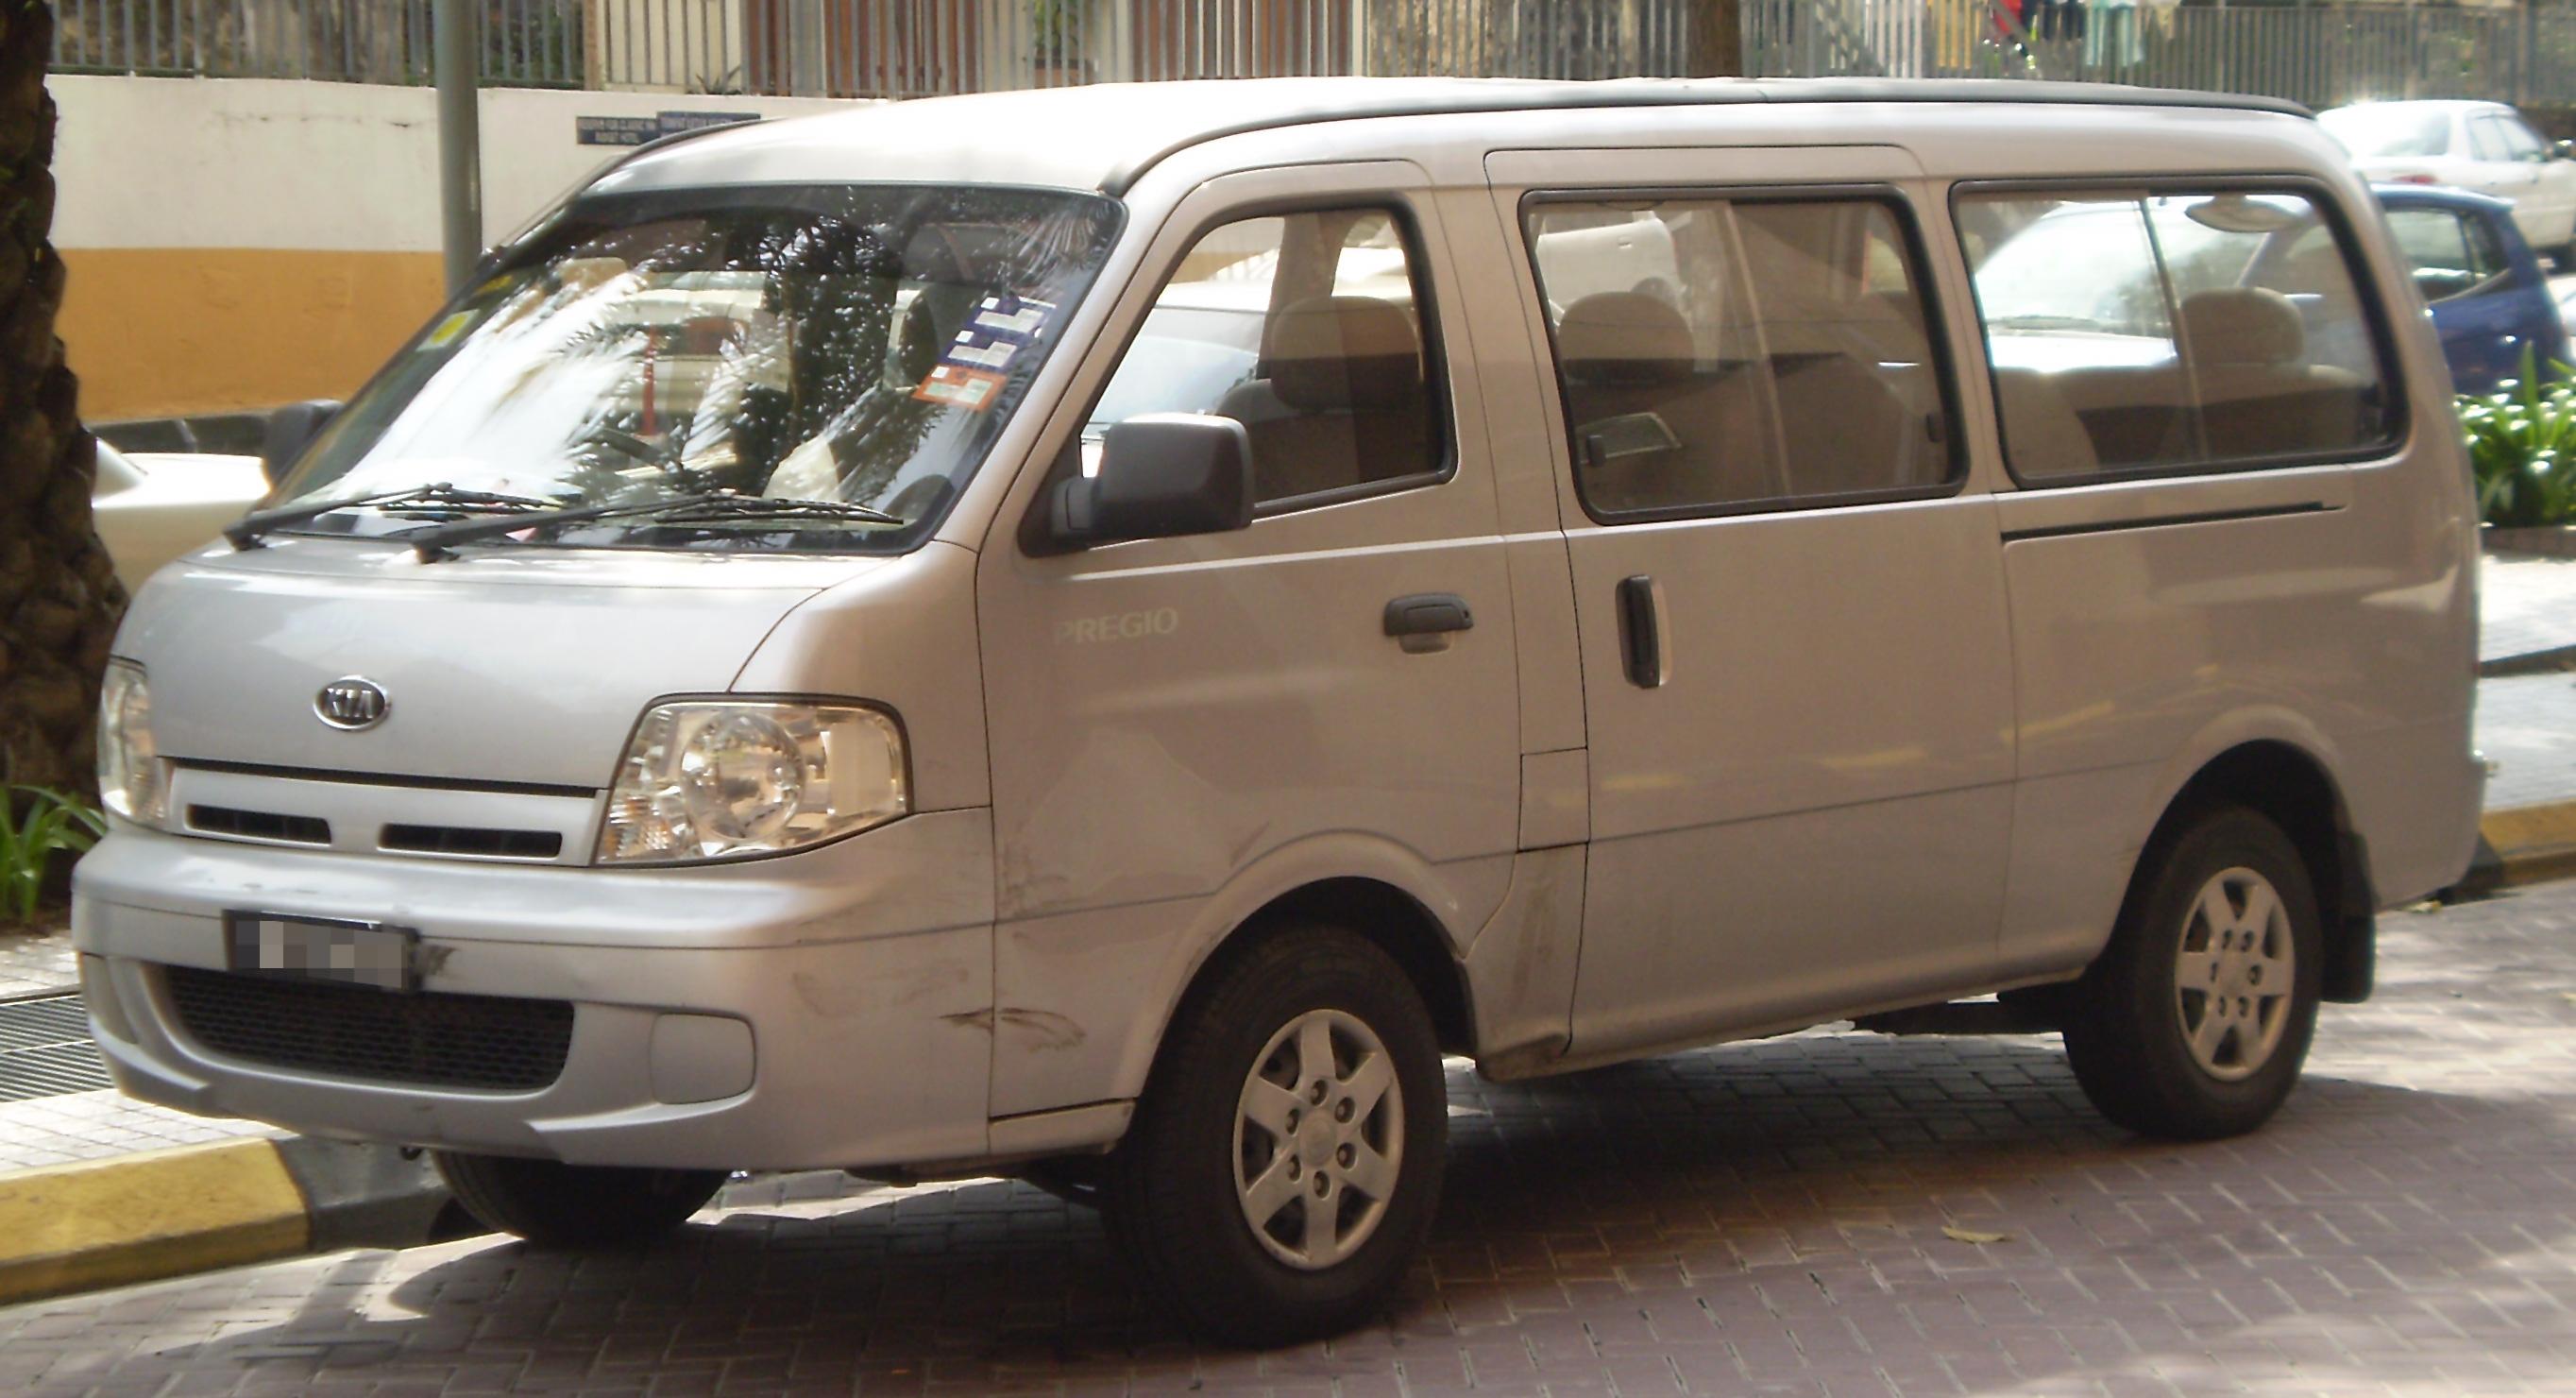 Kia Pregio I Restyling 2003 - 2007 Minivan #4